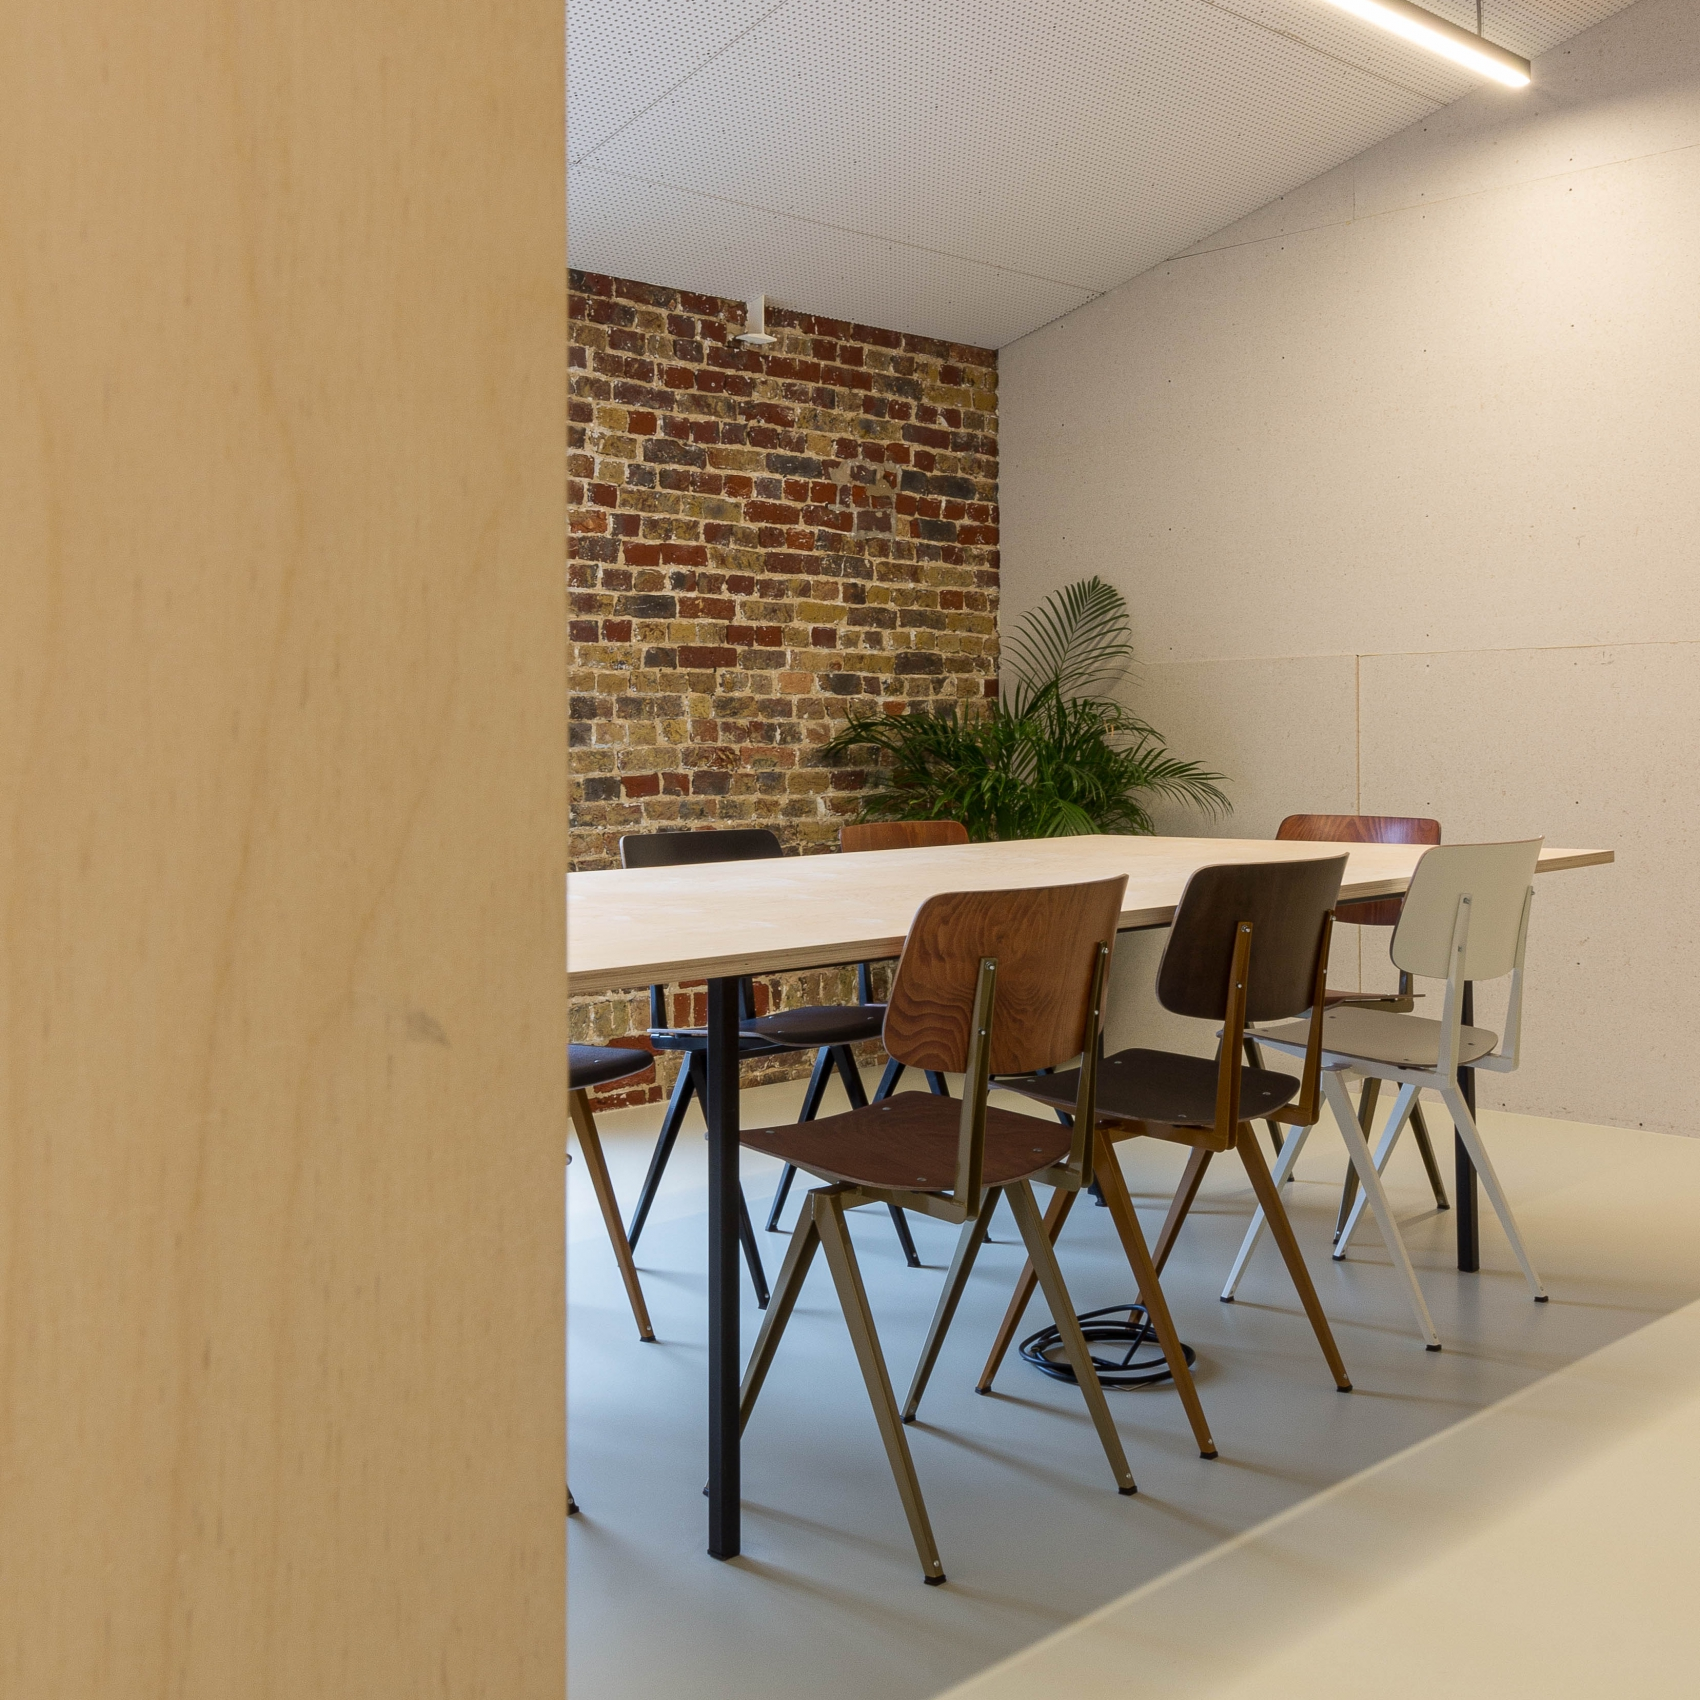 Atelier 12 Boltenhagen